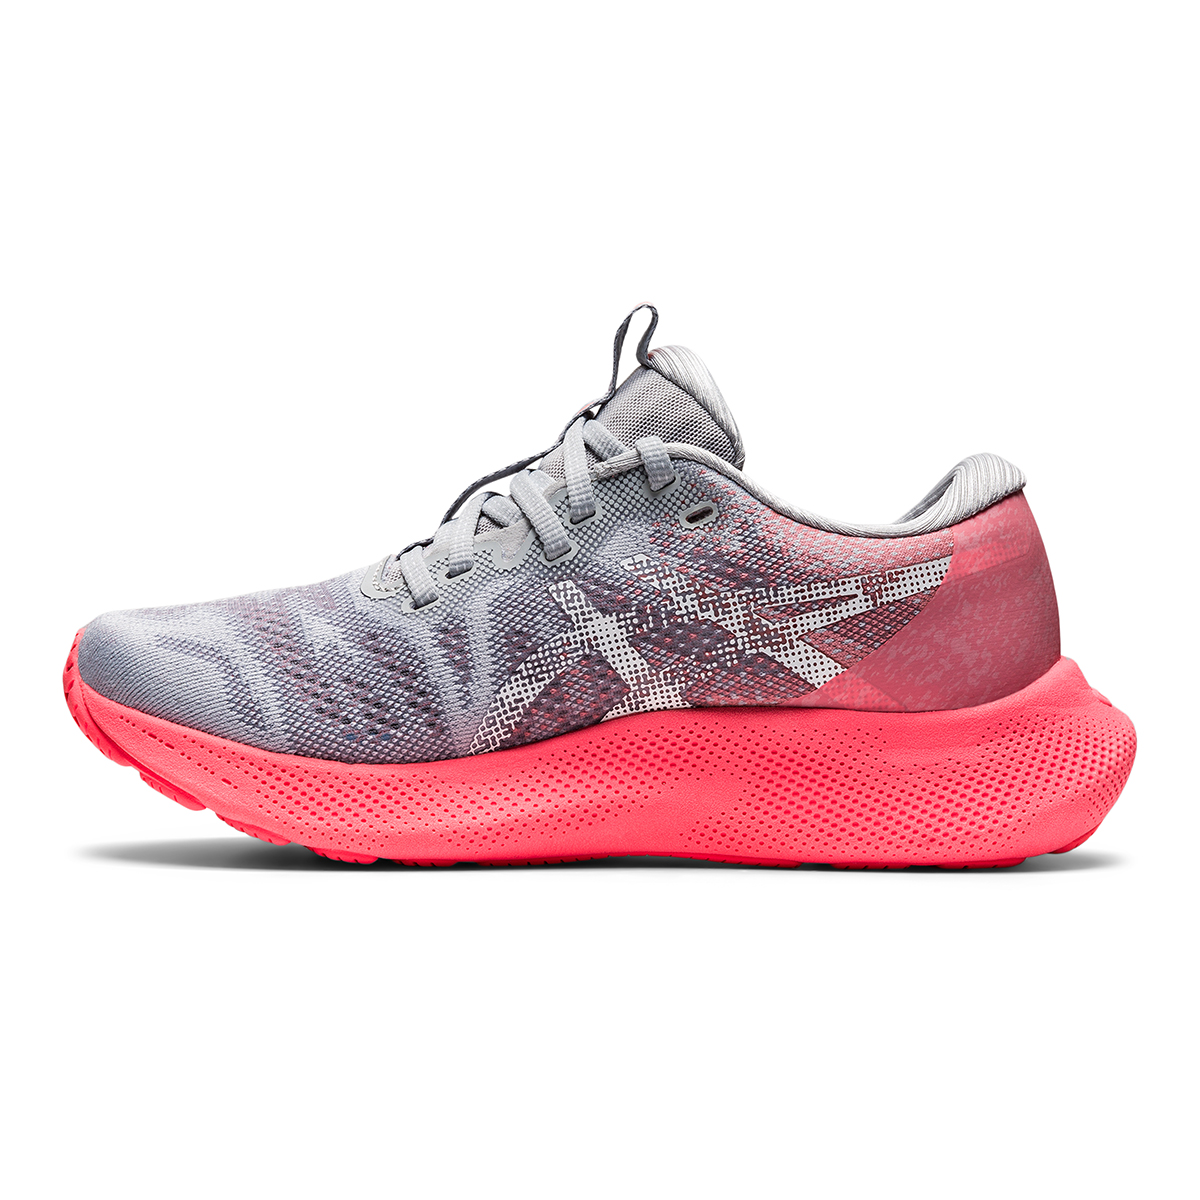 Women's Asics Gel-Nimbus Lite 2 Running Shoe - Color: Blazing Coral  - Size: 5 - Width: Regular, Blazing Coral, large, image 2